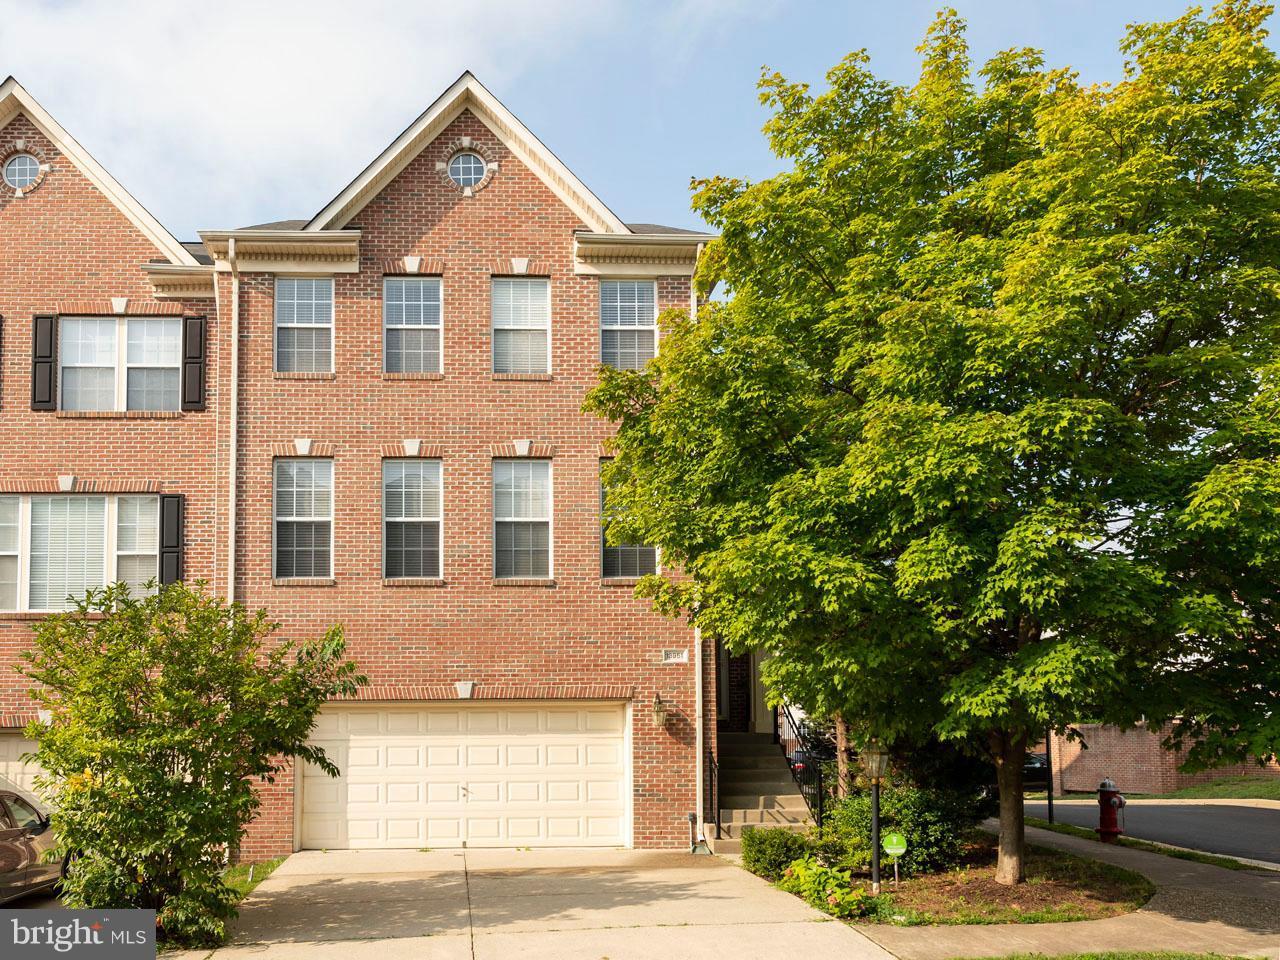 VAFX426100-301143657881-2021-09-05-14-39-03  |   | Chantilly Delaware Real Estate For Sale | MLS# Vafx426100  - Best of Northern Virginia